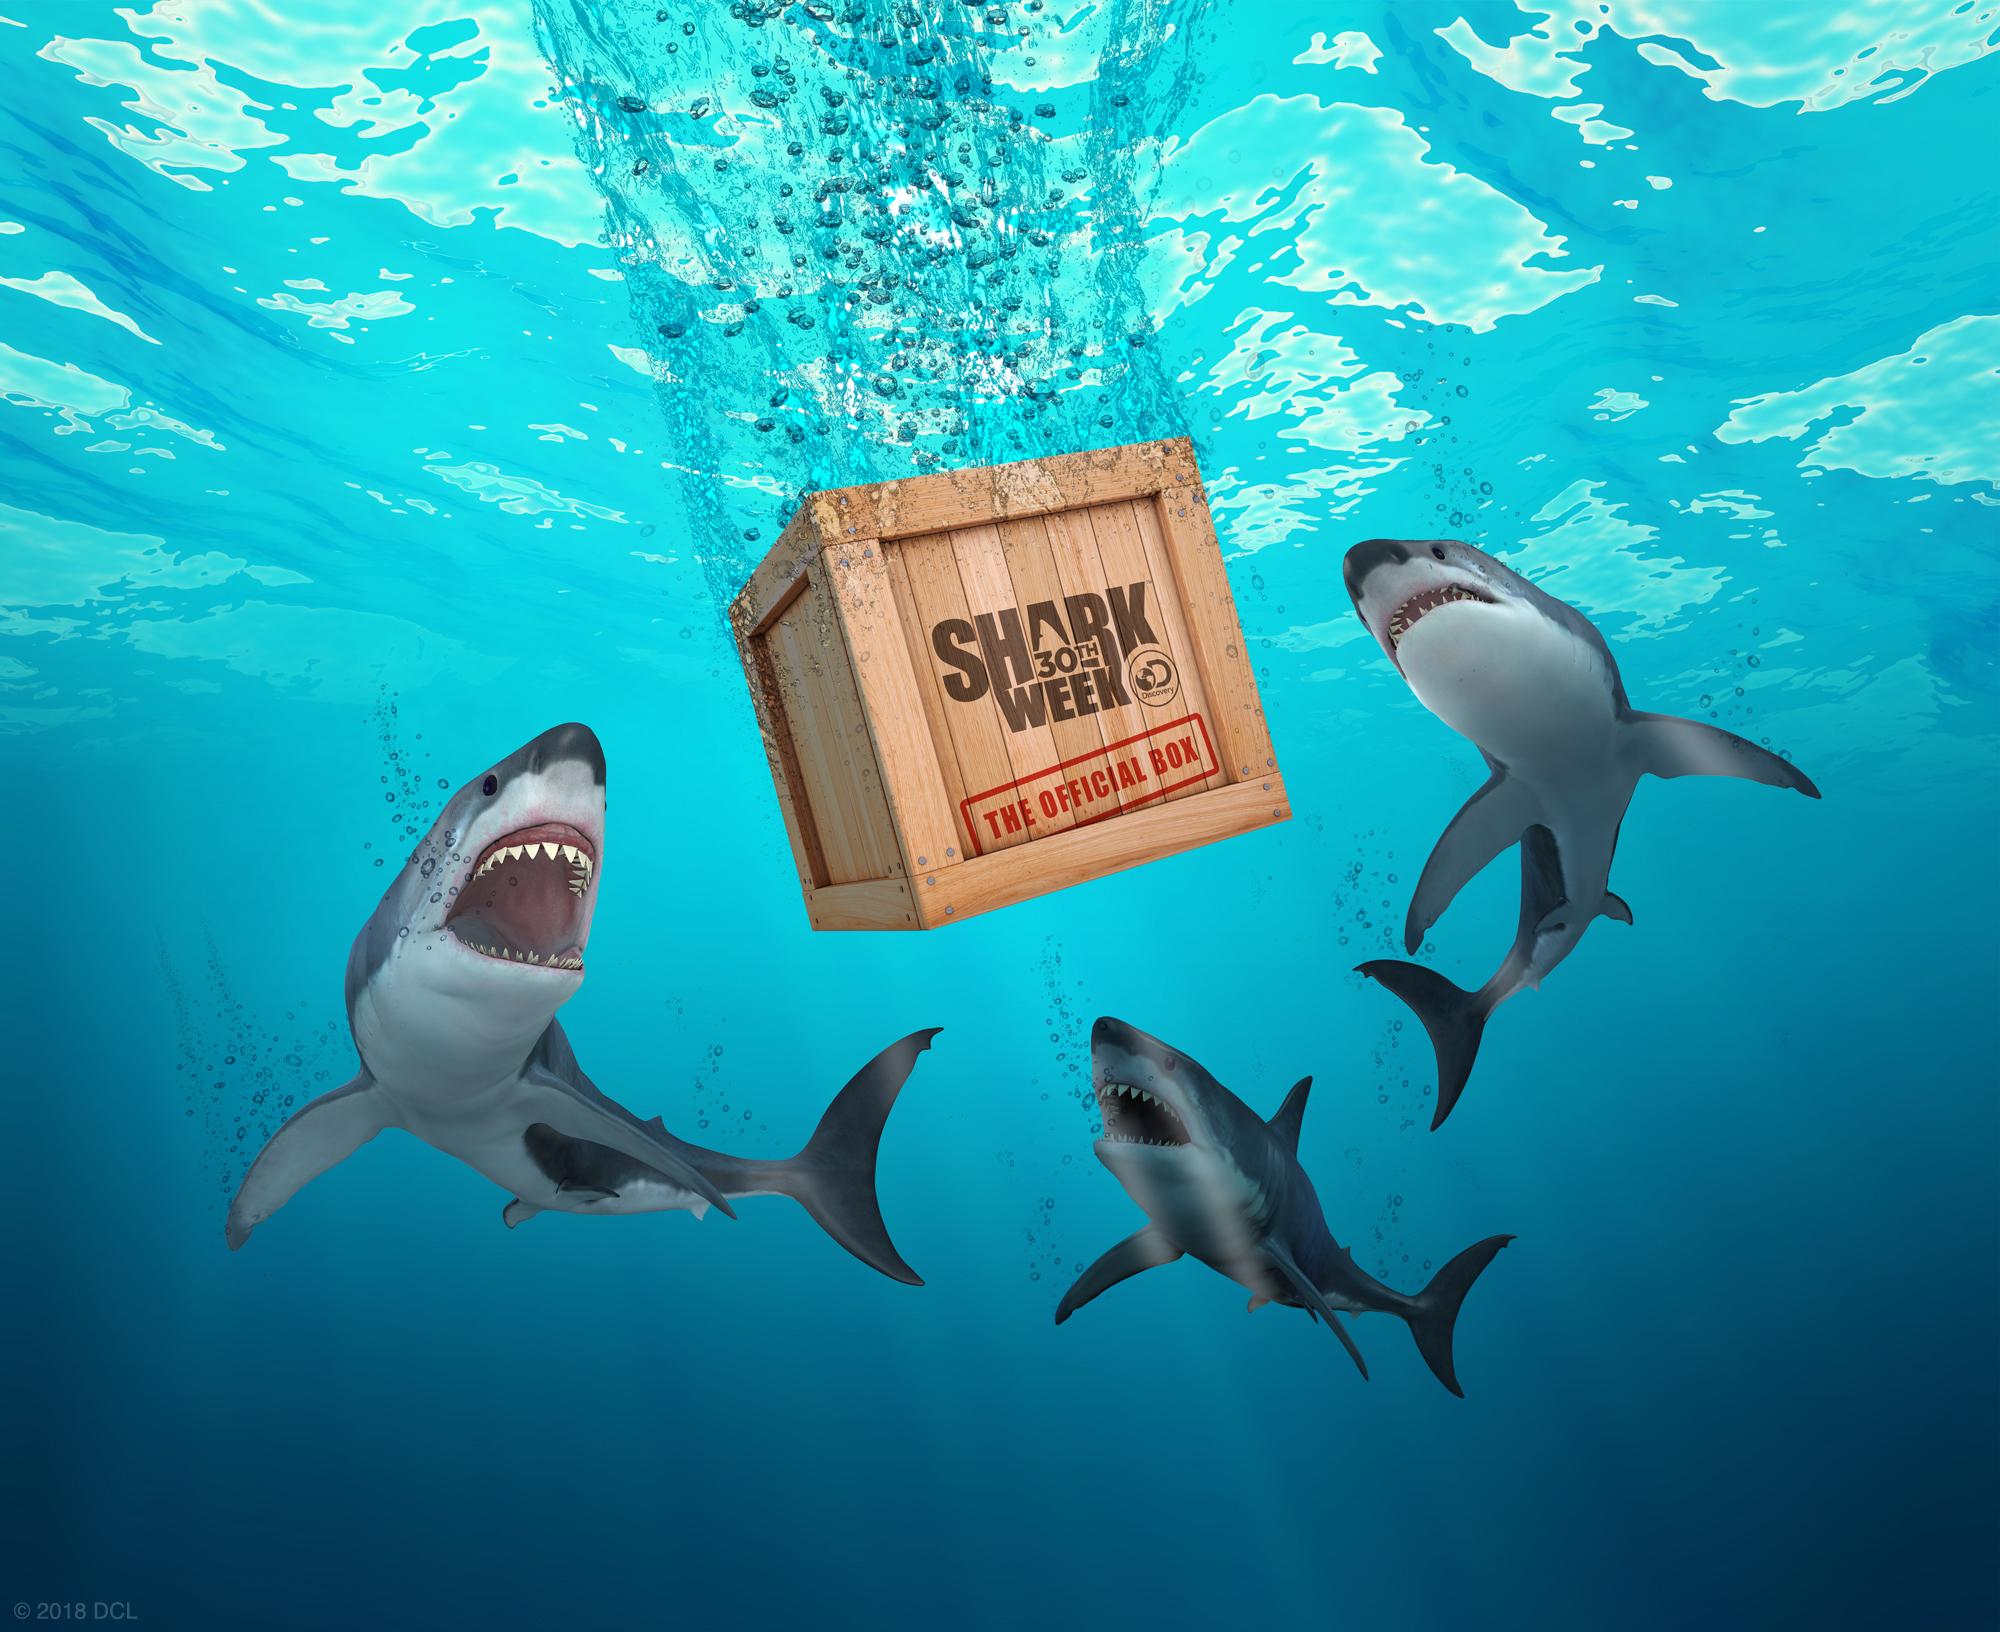 The Shark Week Box